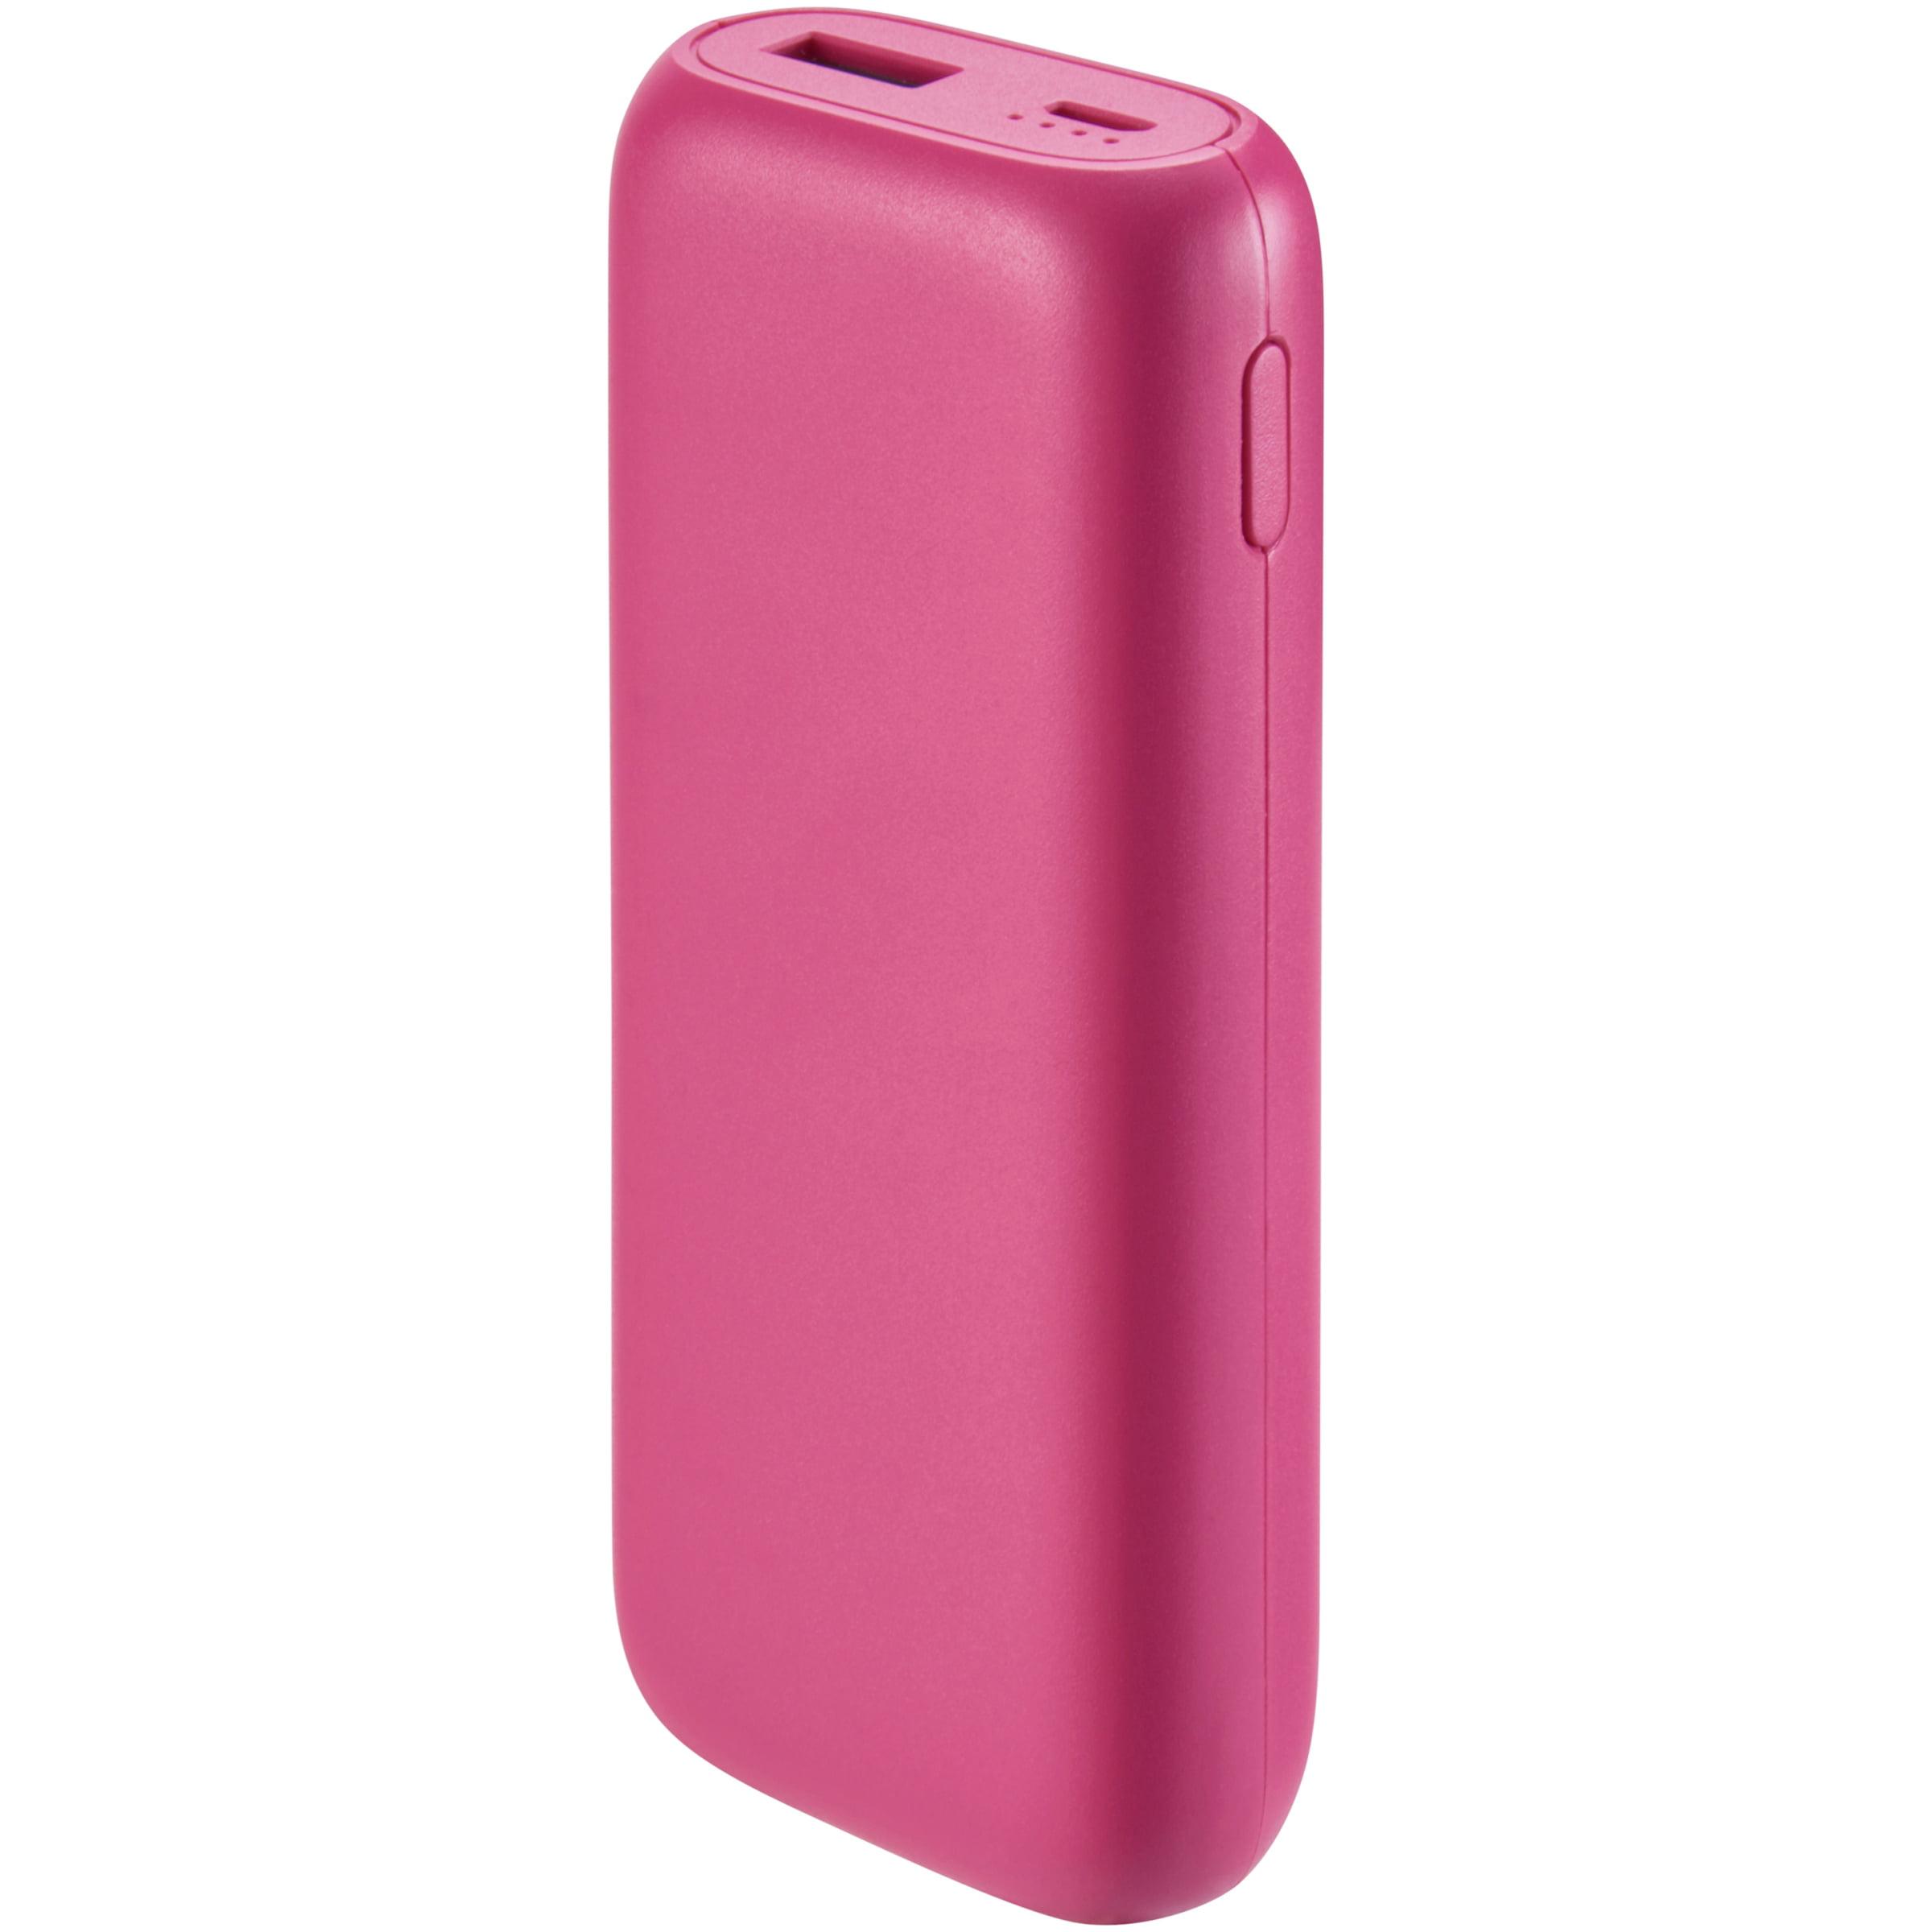 Onn Portable Battery Power Bank, 6700 Mah, Pink